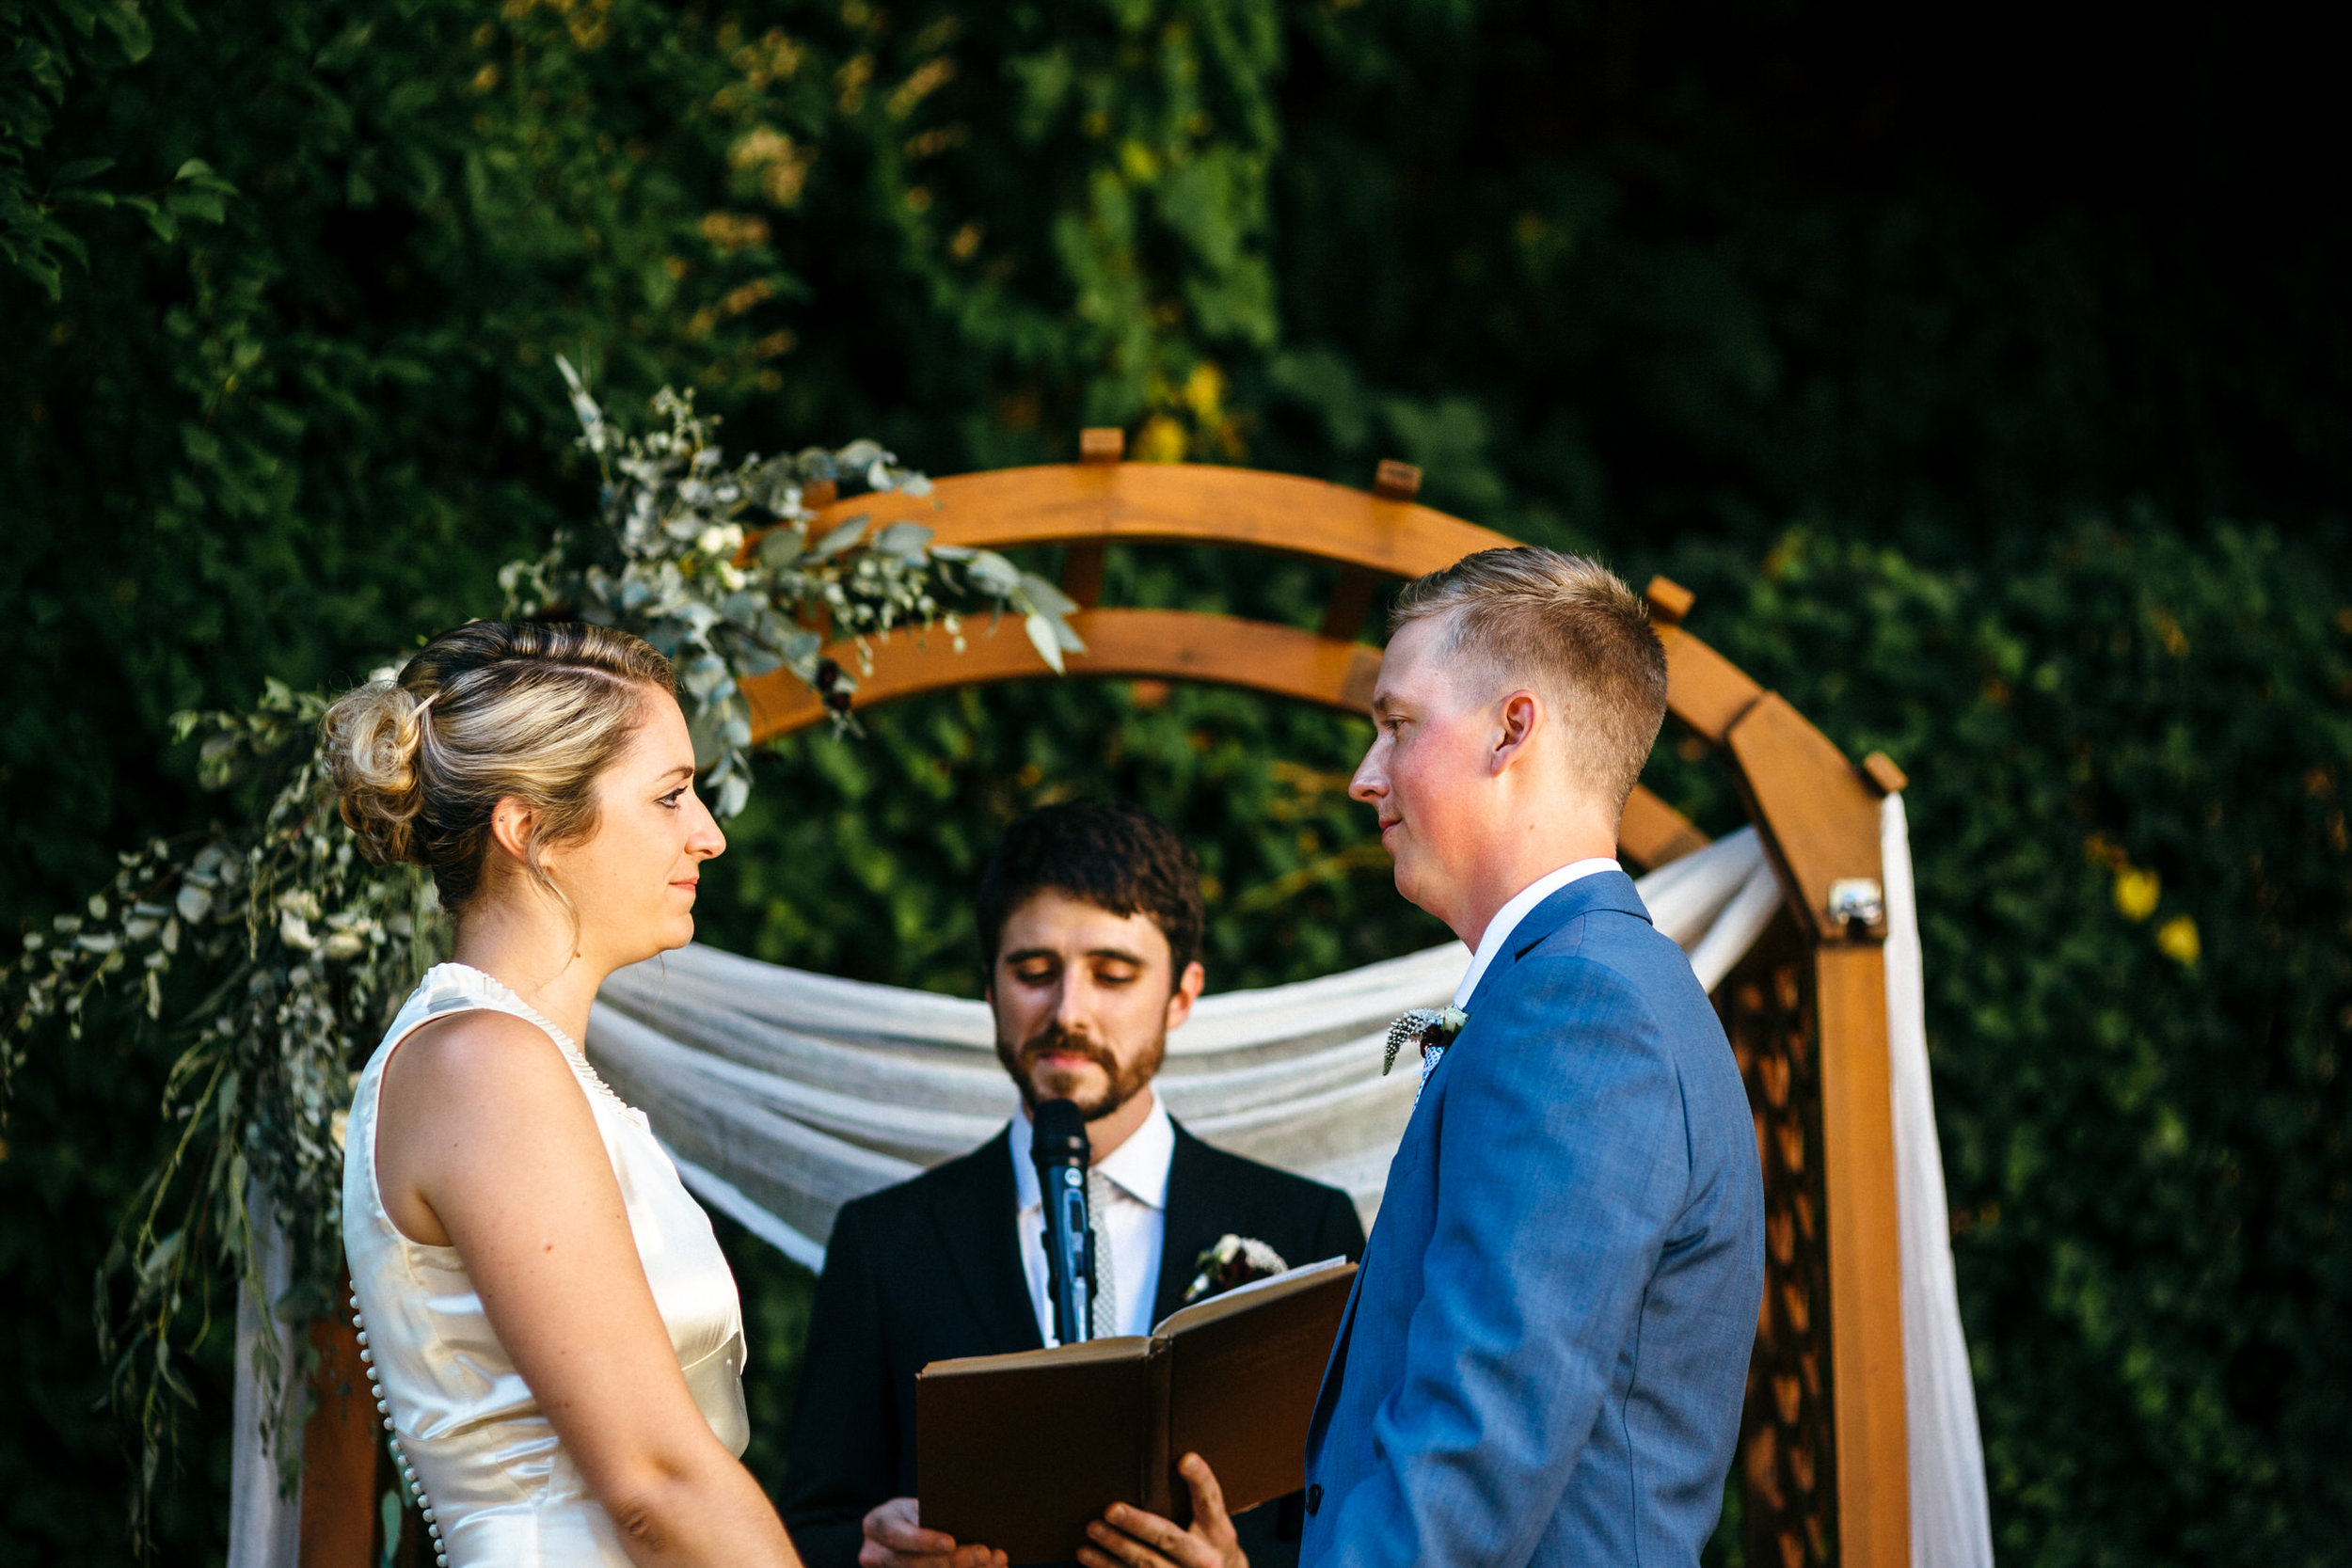 Laurelhurst Park club wedding photographer Portand pdx Oregon061.JPG